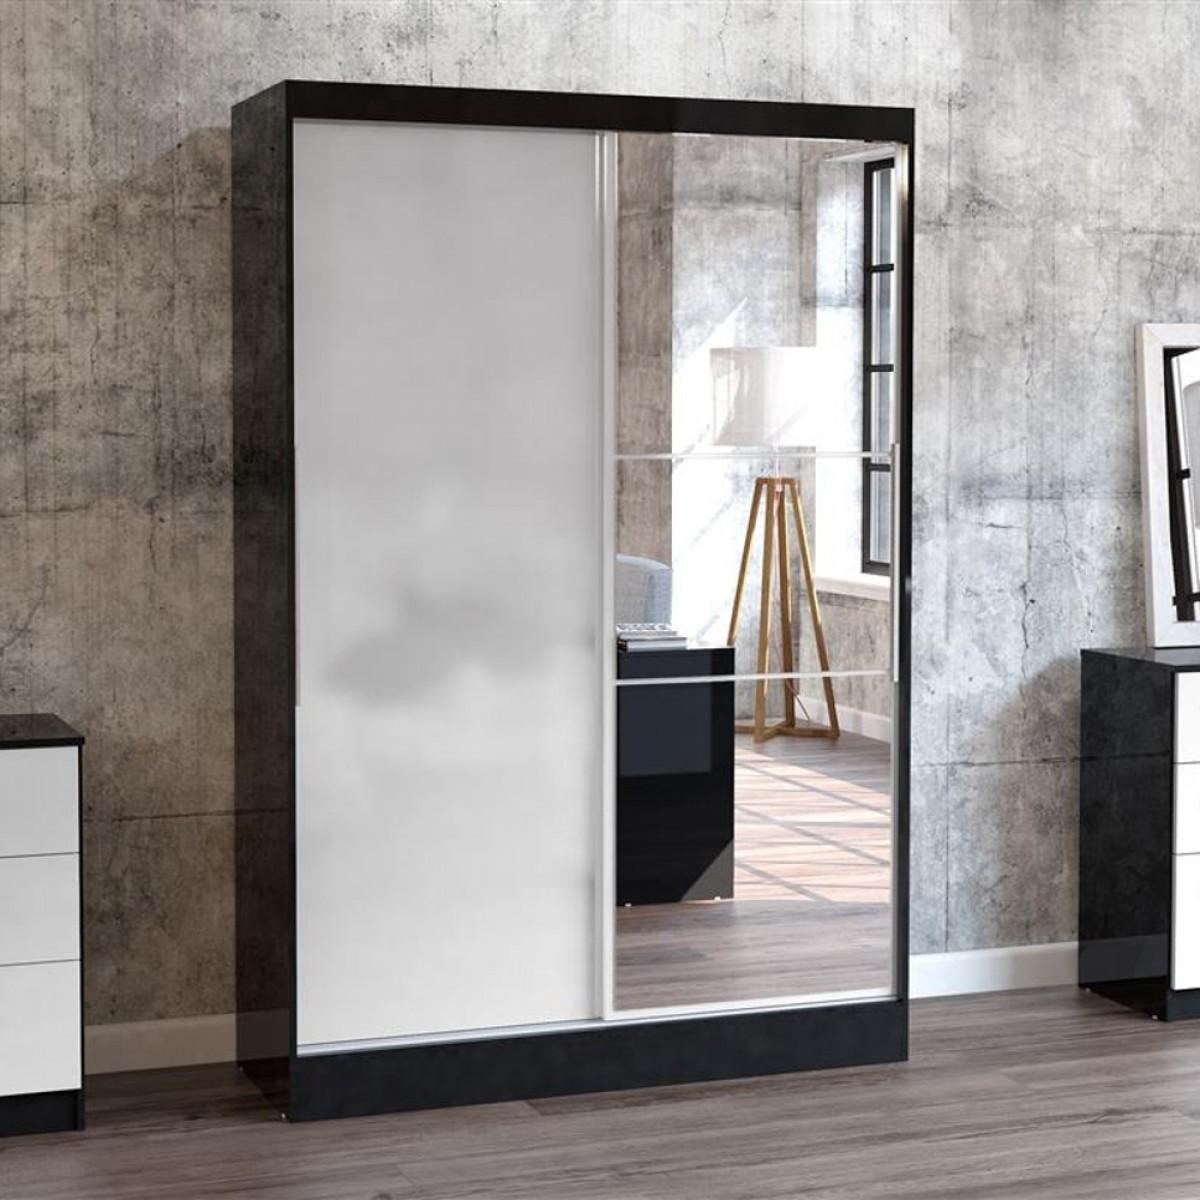 Lynx 2 Door Sliding Mirrored Wardrobe Black and White